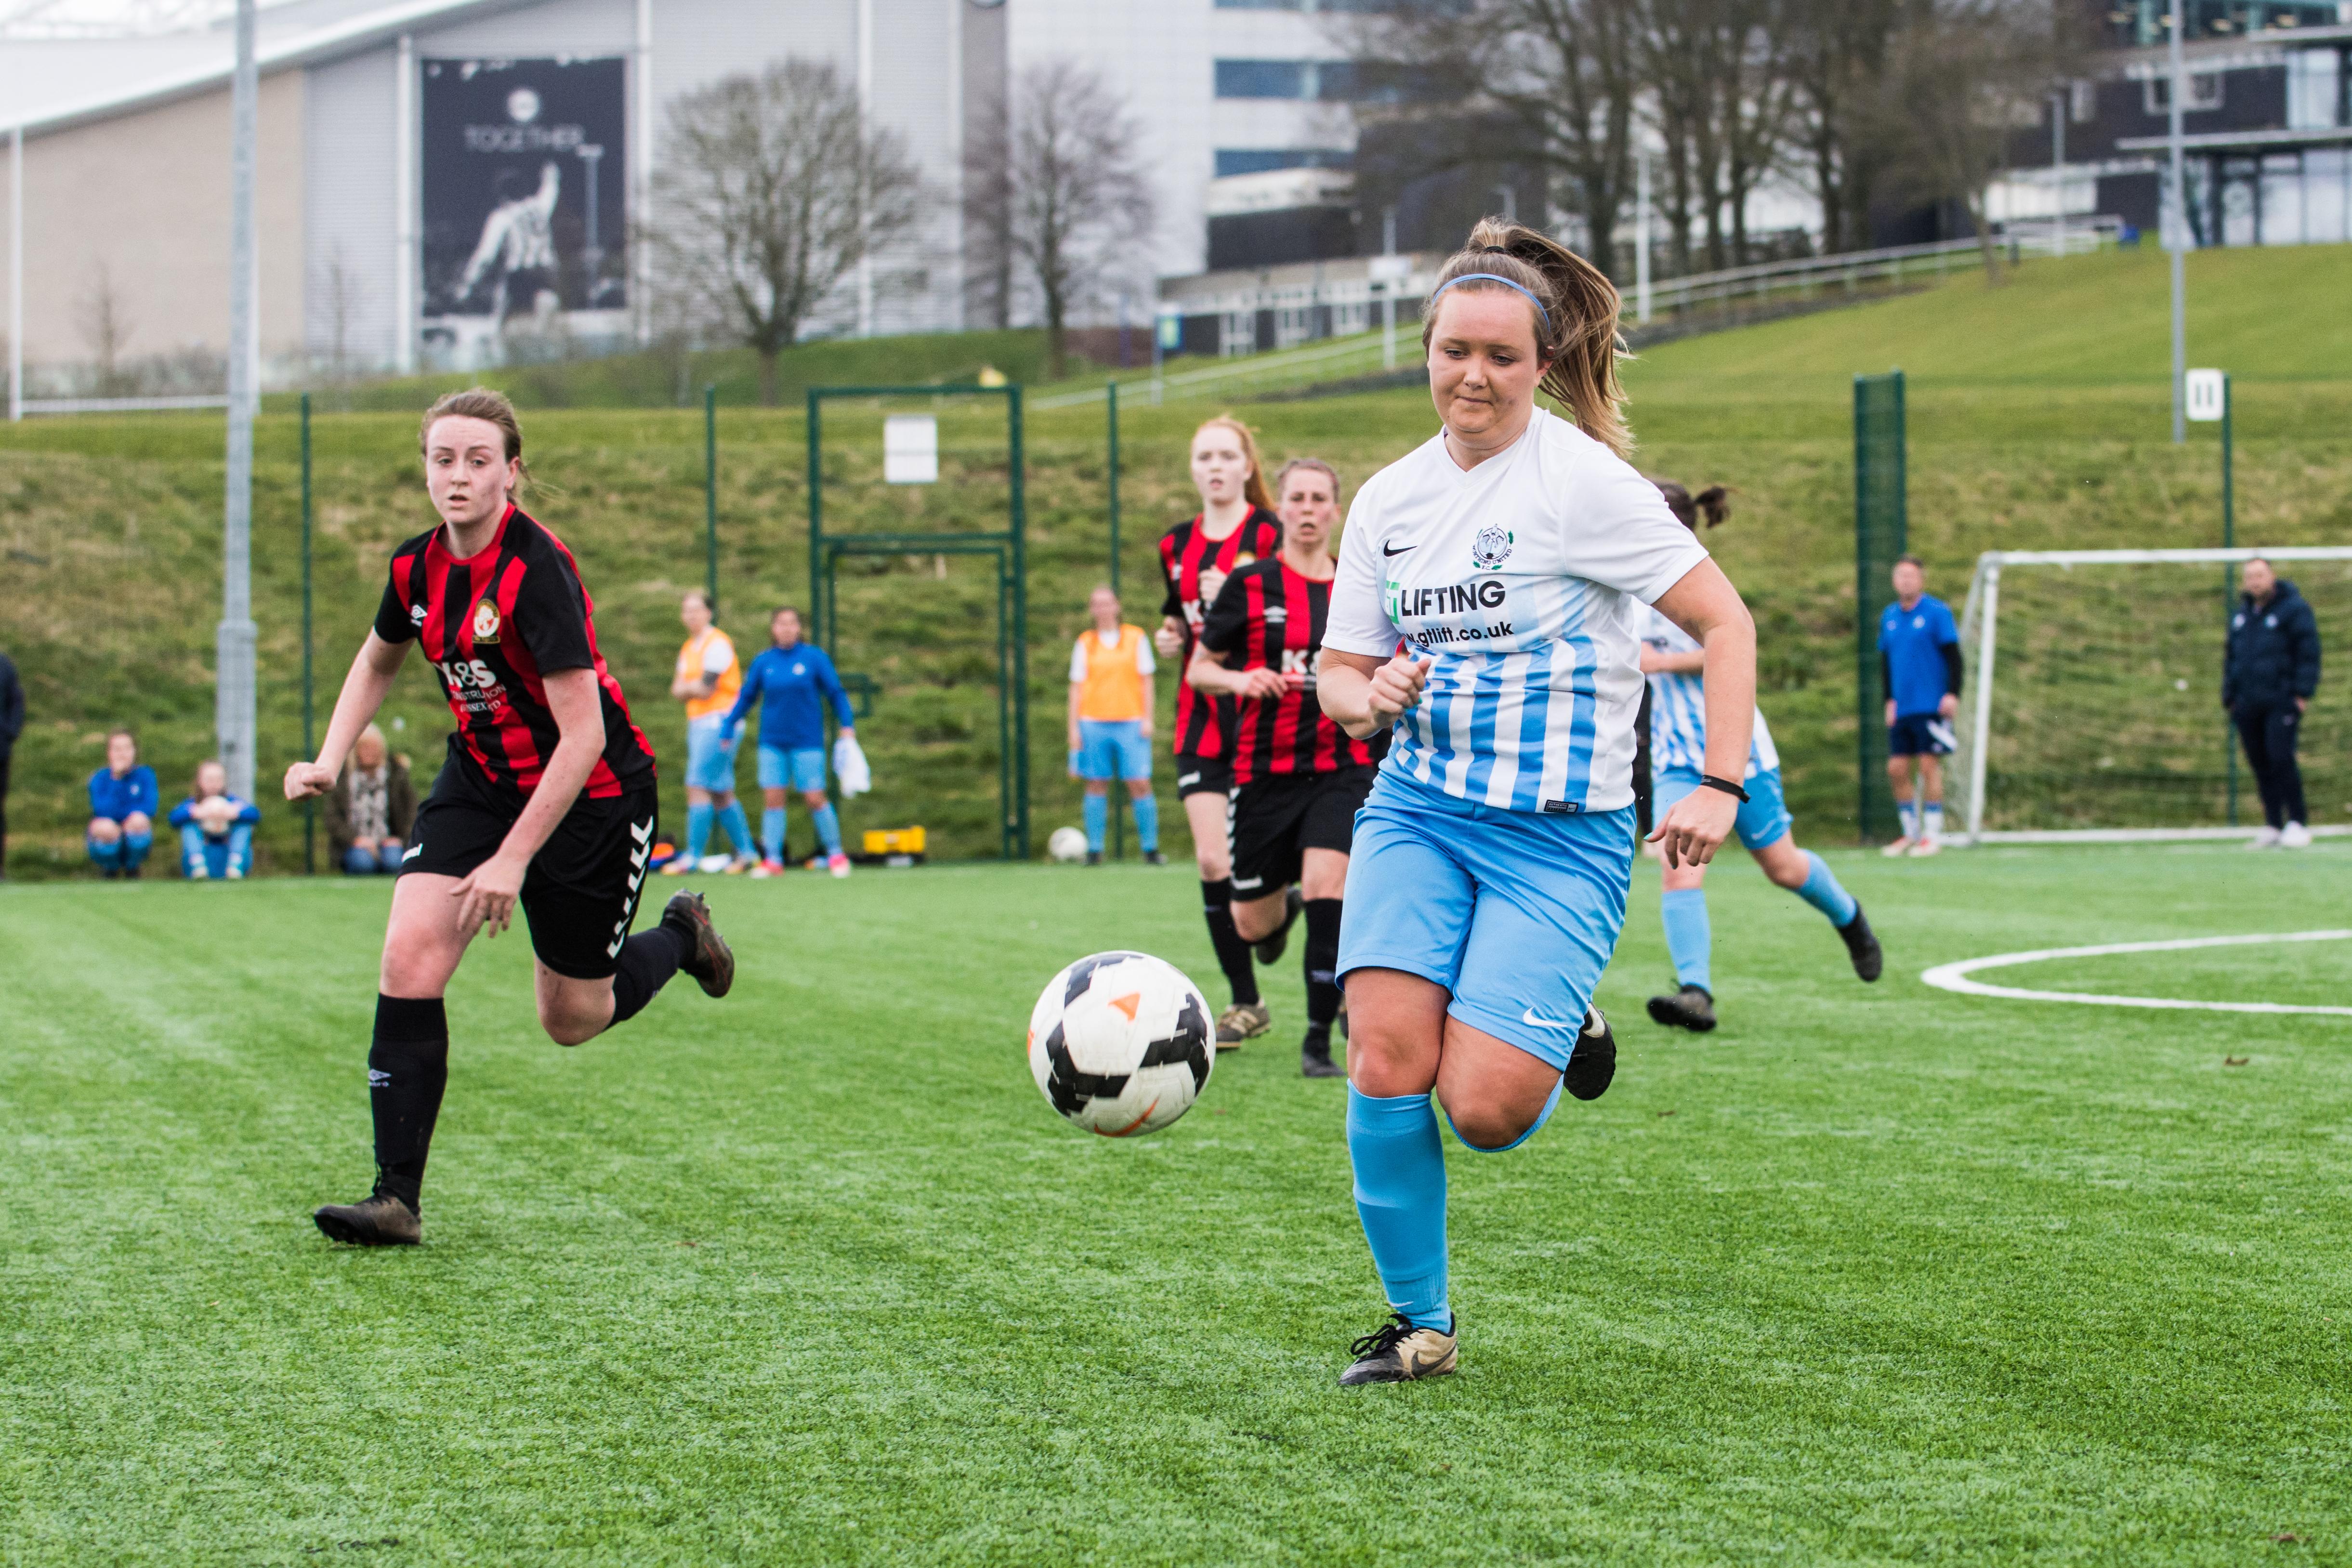 DAVID_JEFFERY Saltdean Utd Ladies FC vs Worthing Utd Ladies FC 11.03.18 41